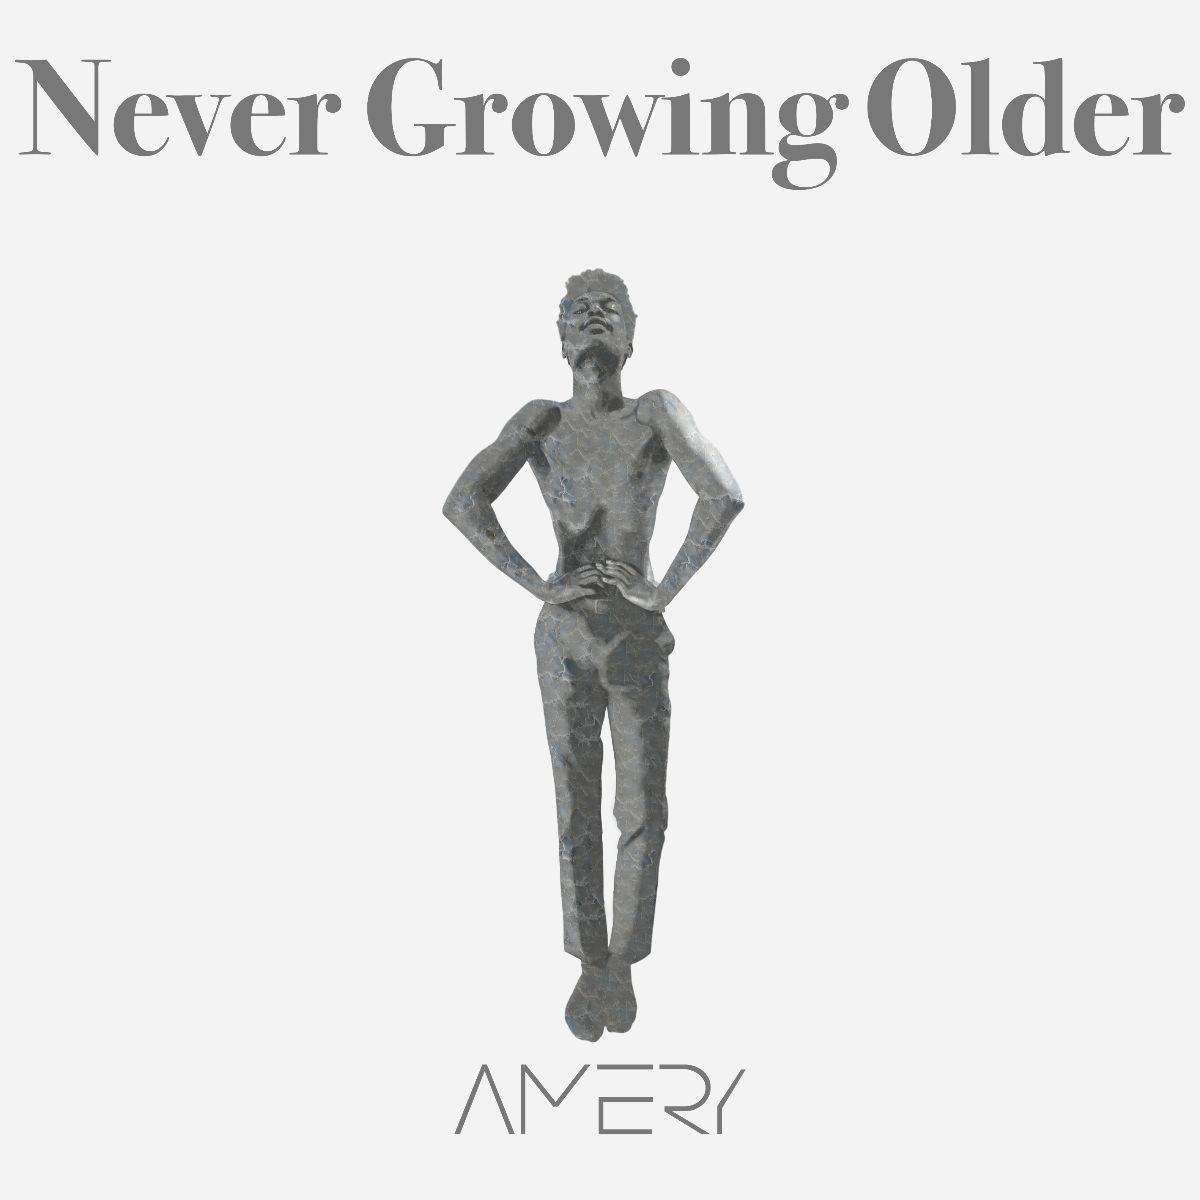 Amery - Never Growing Older artwork